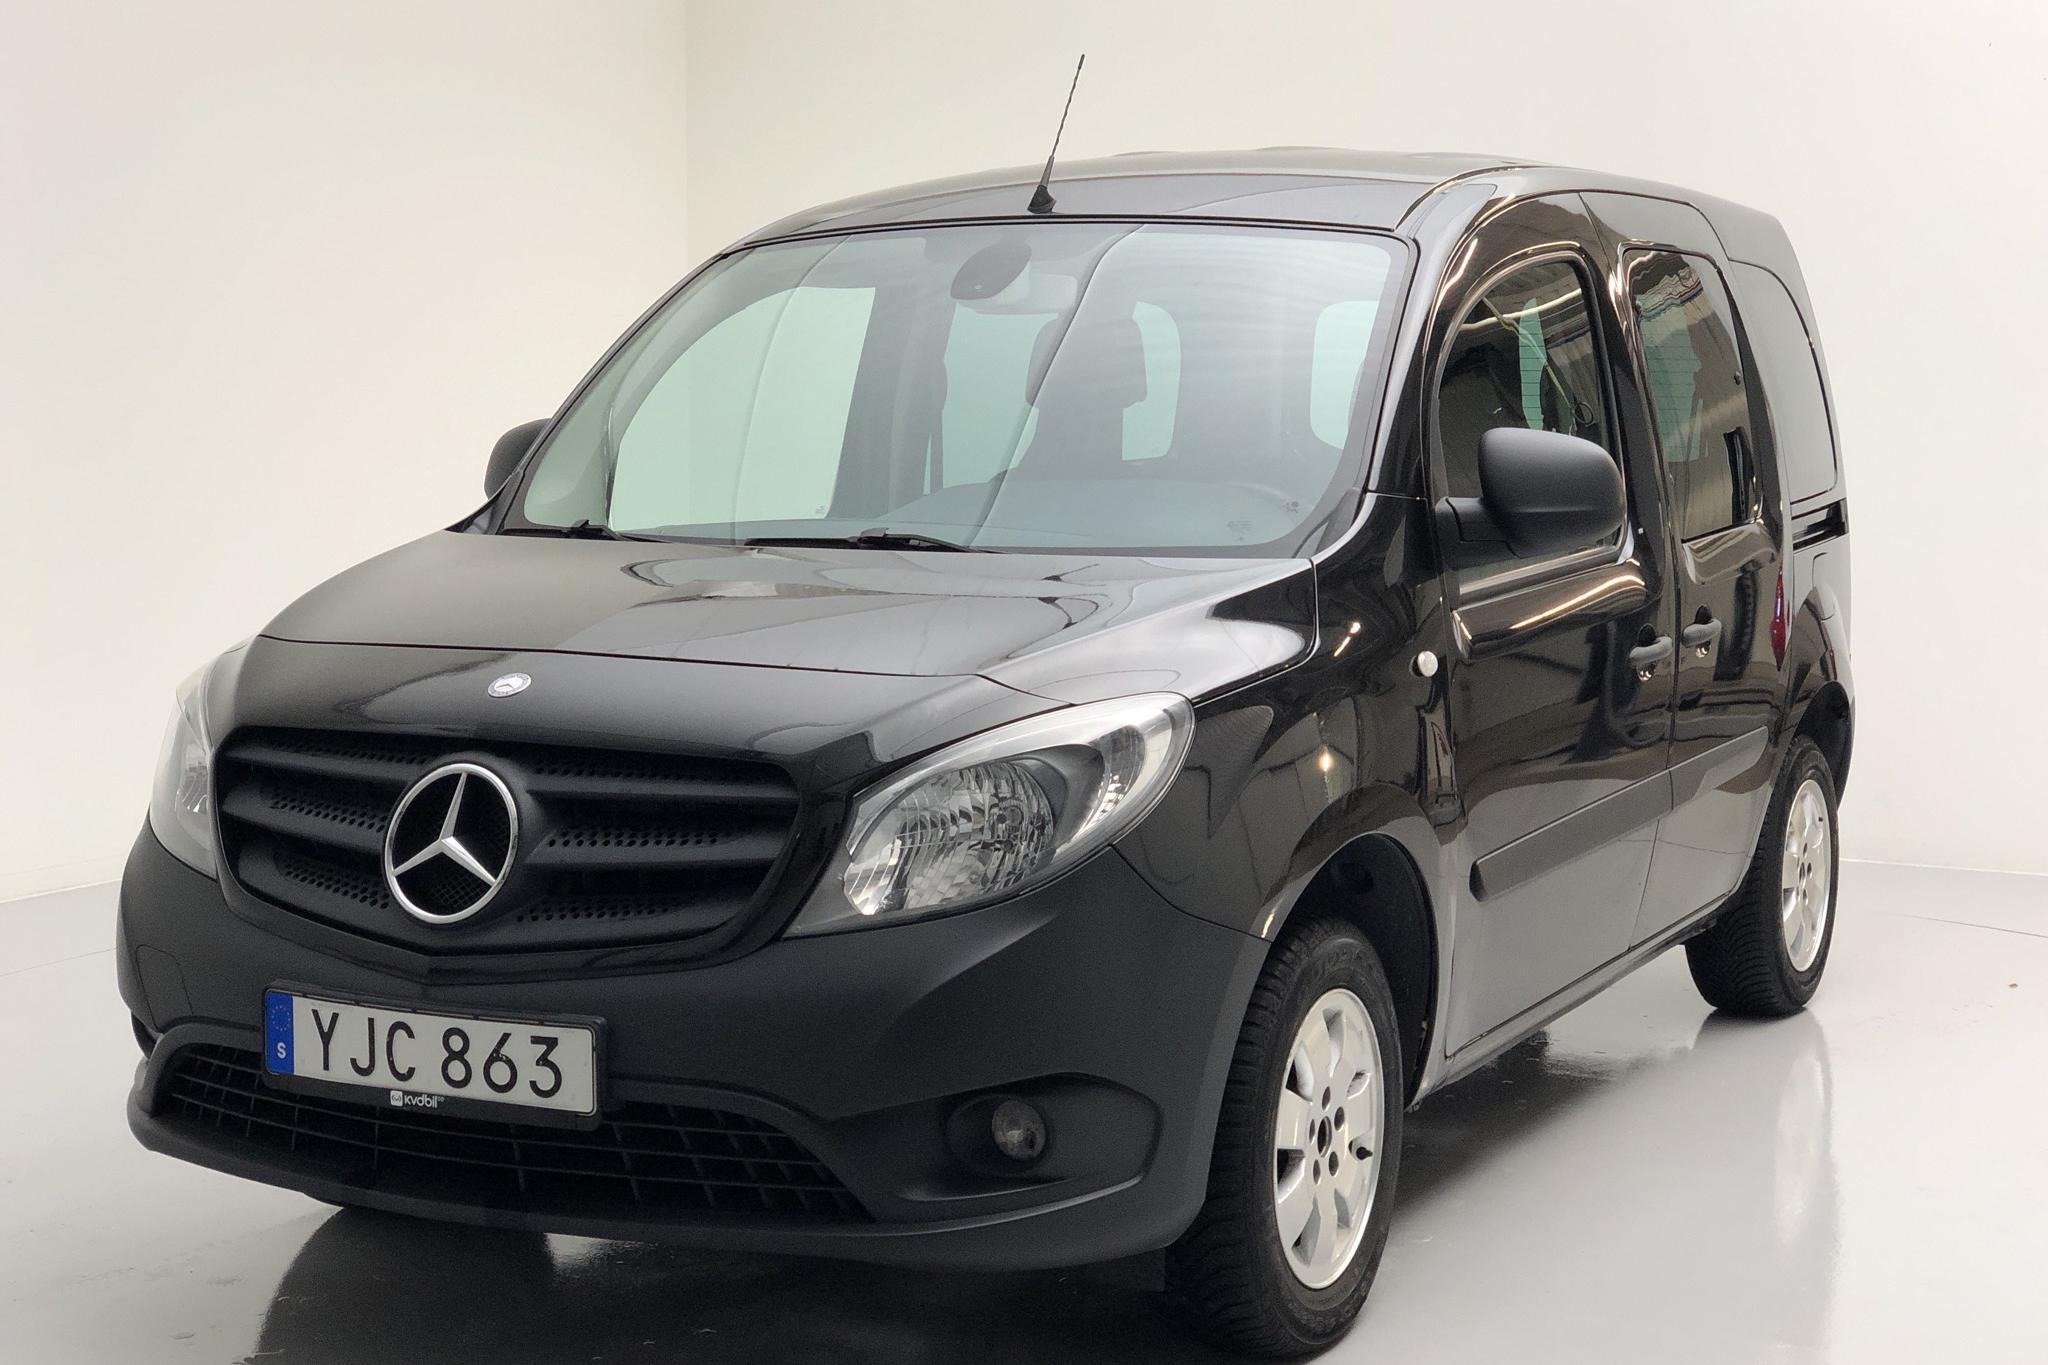 Mercedes Citan 109 1.5 CDI (90hk) - 13 100 mil - Manuell - svart - 2014